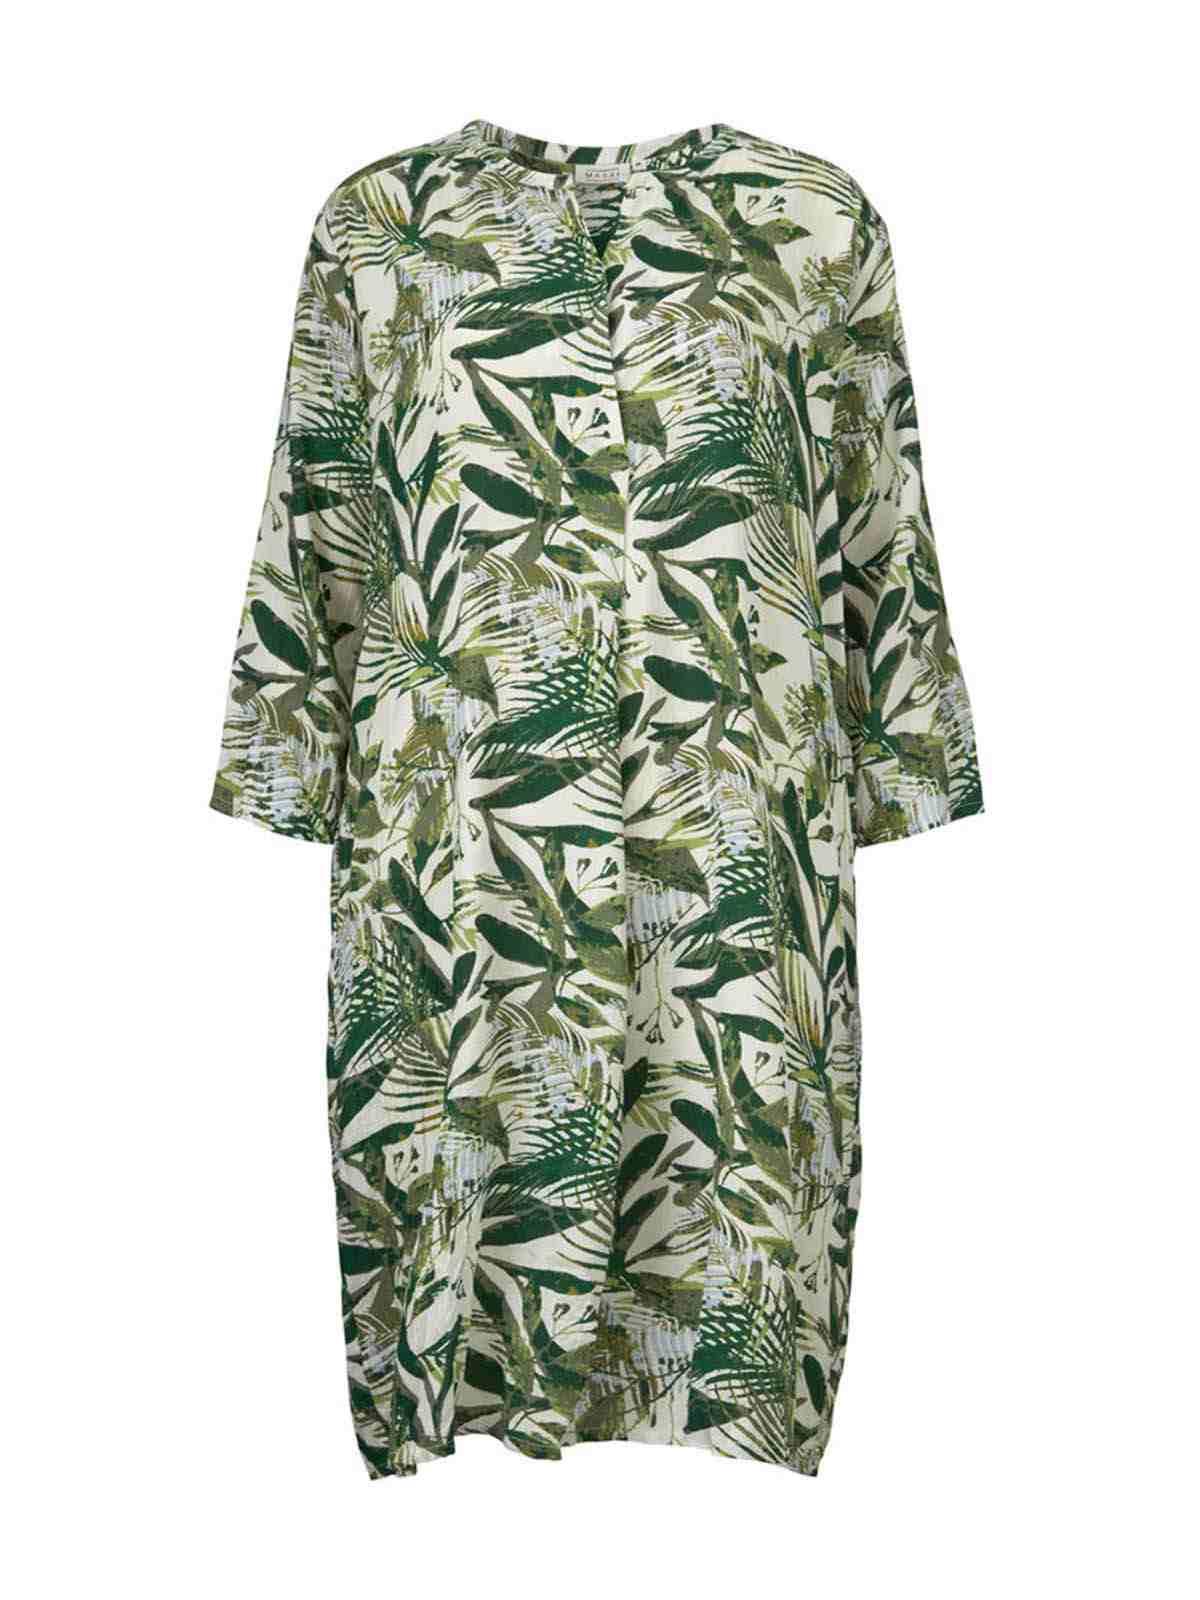 7c72bfae43952 Natalia Dress Masai Clothing Katie Kerr Women's Clothing